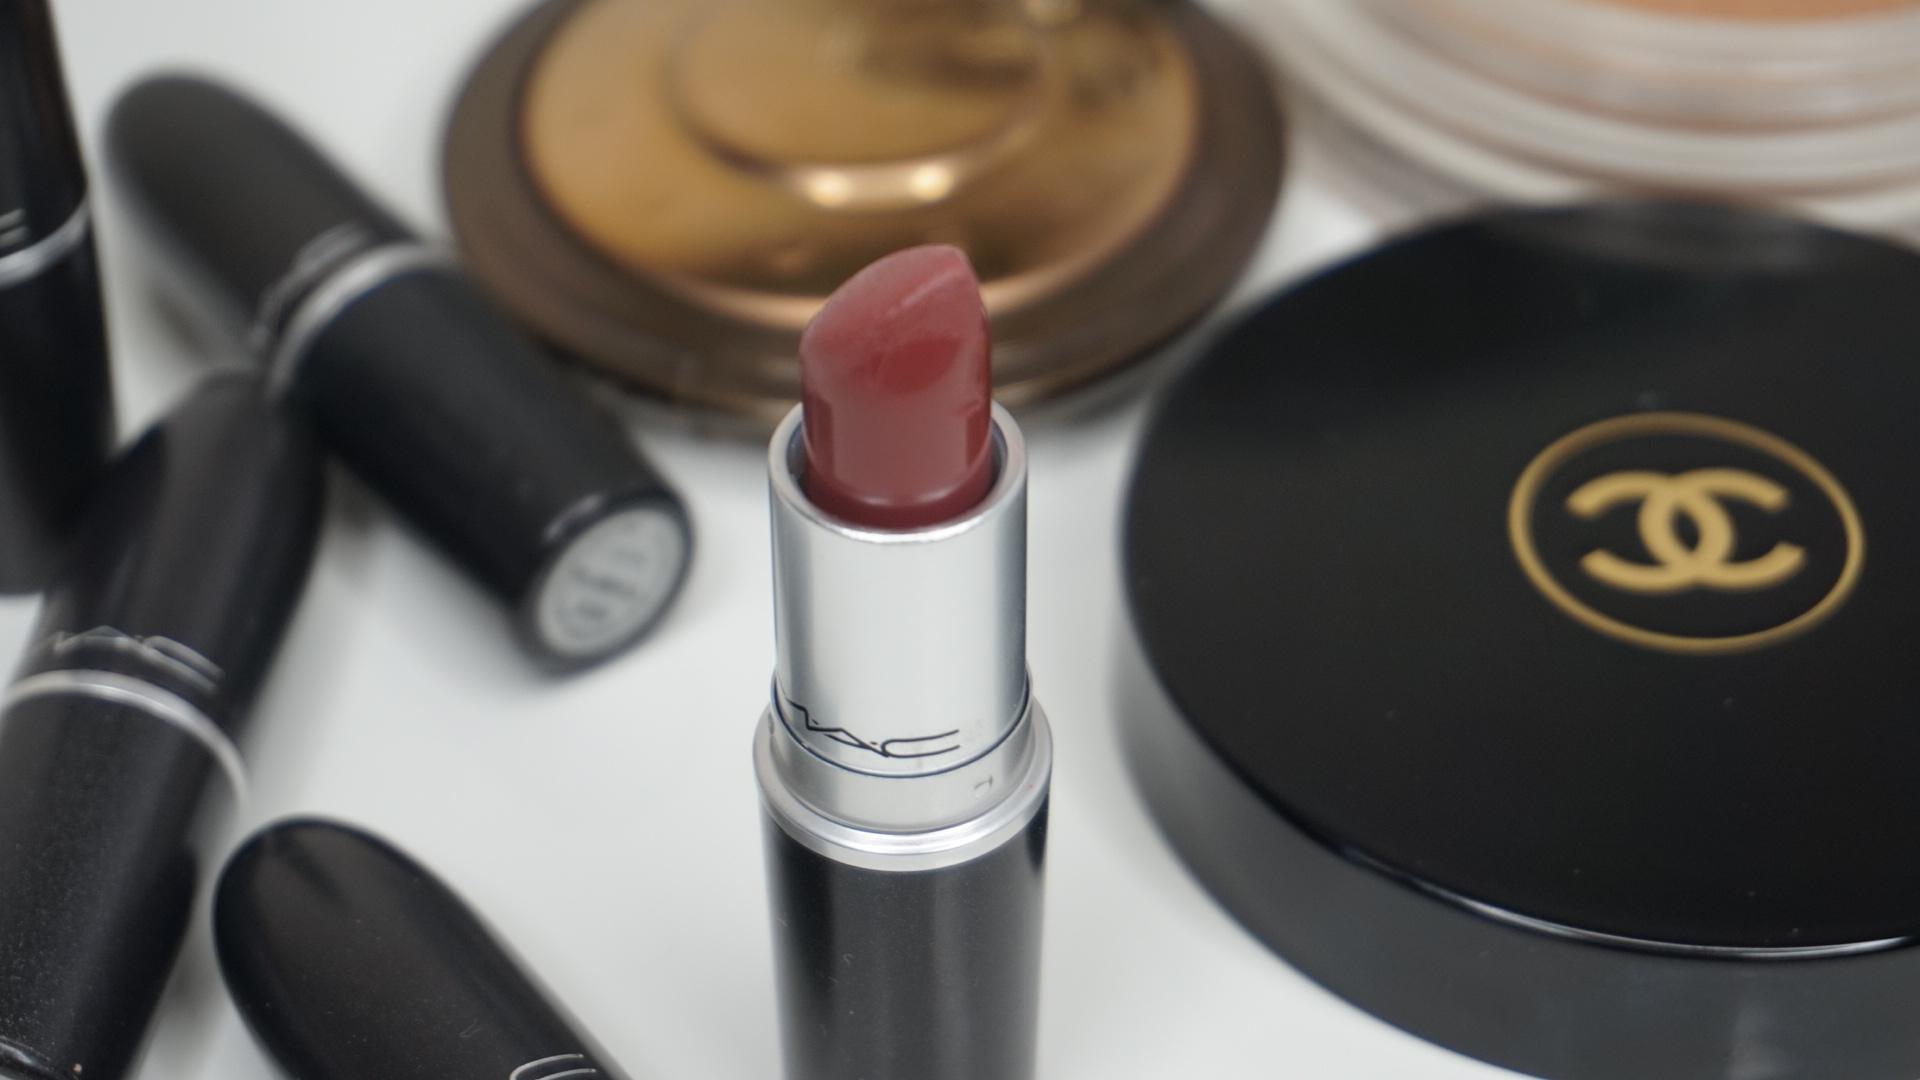 Top Mac Lipsticks for Fall